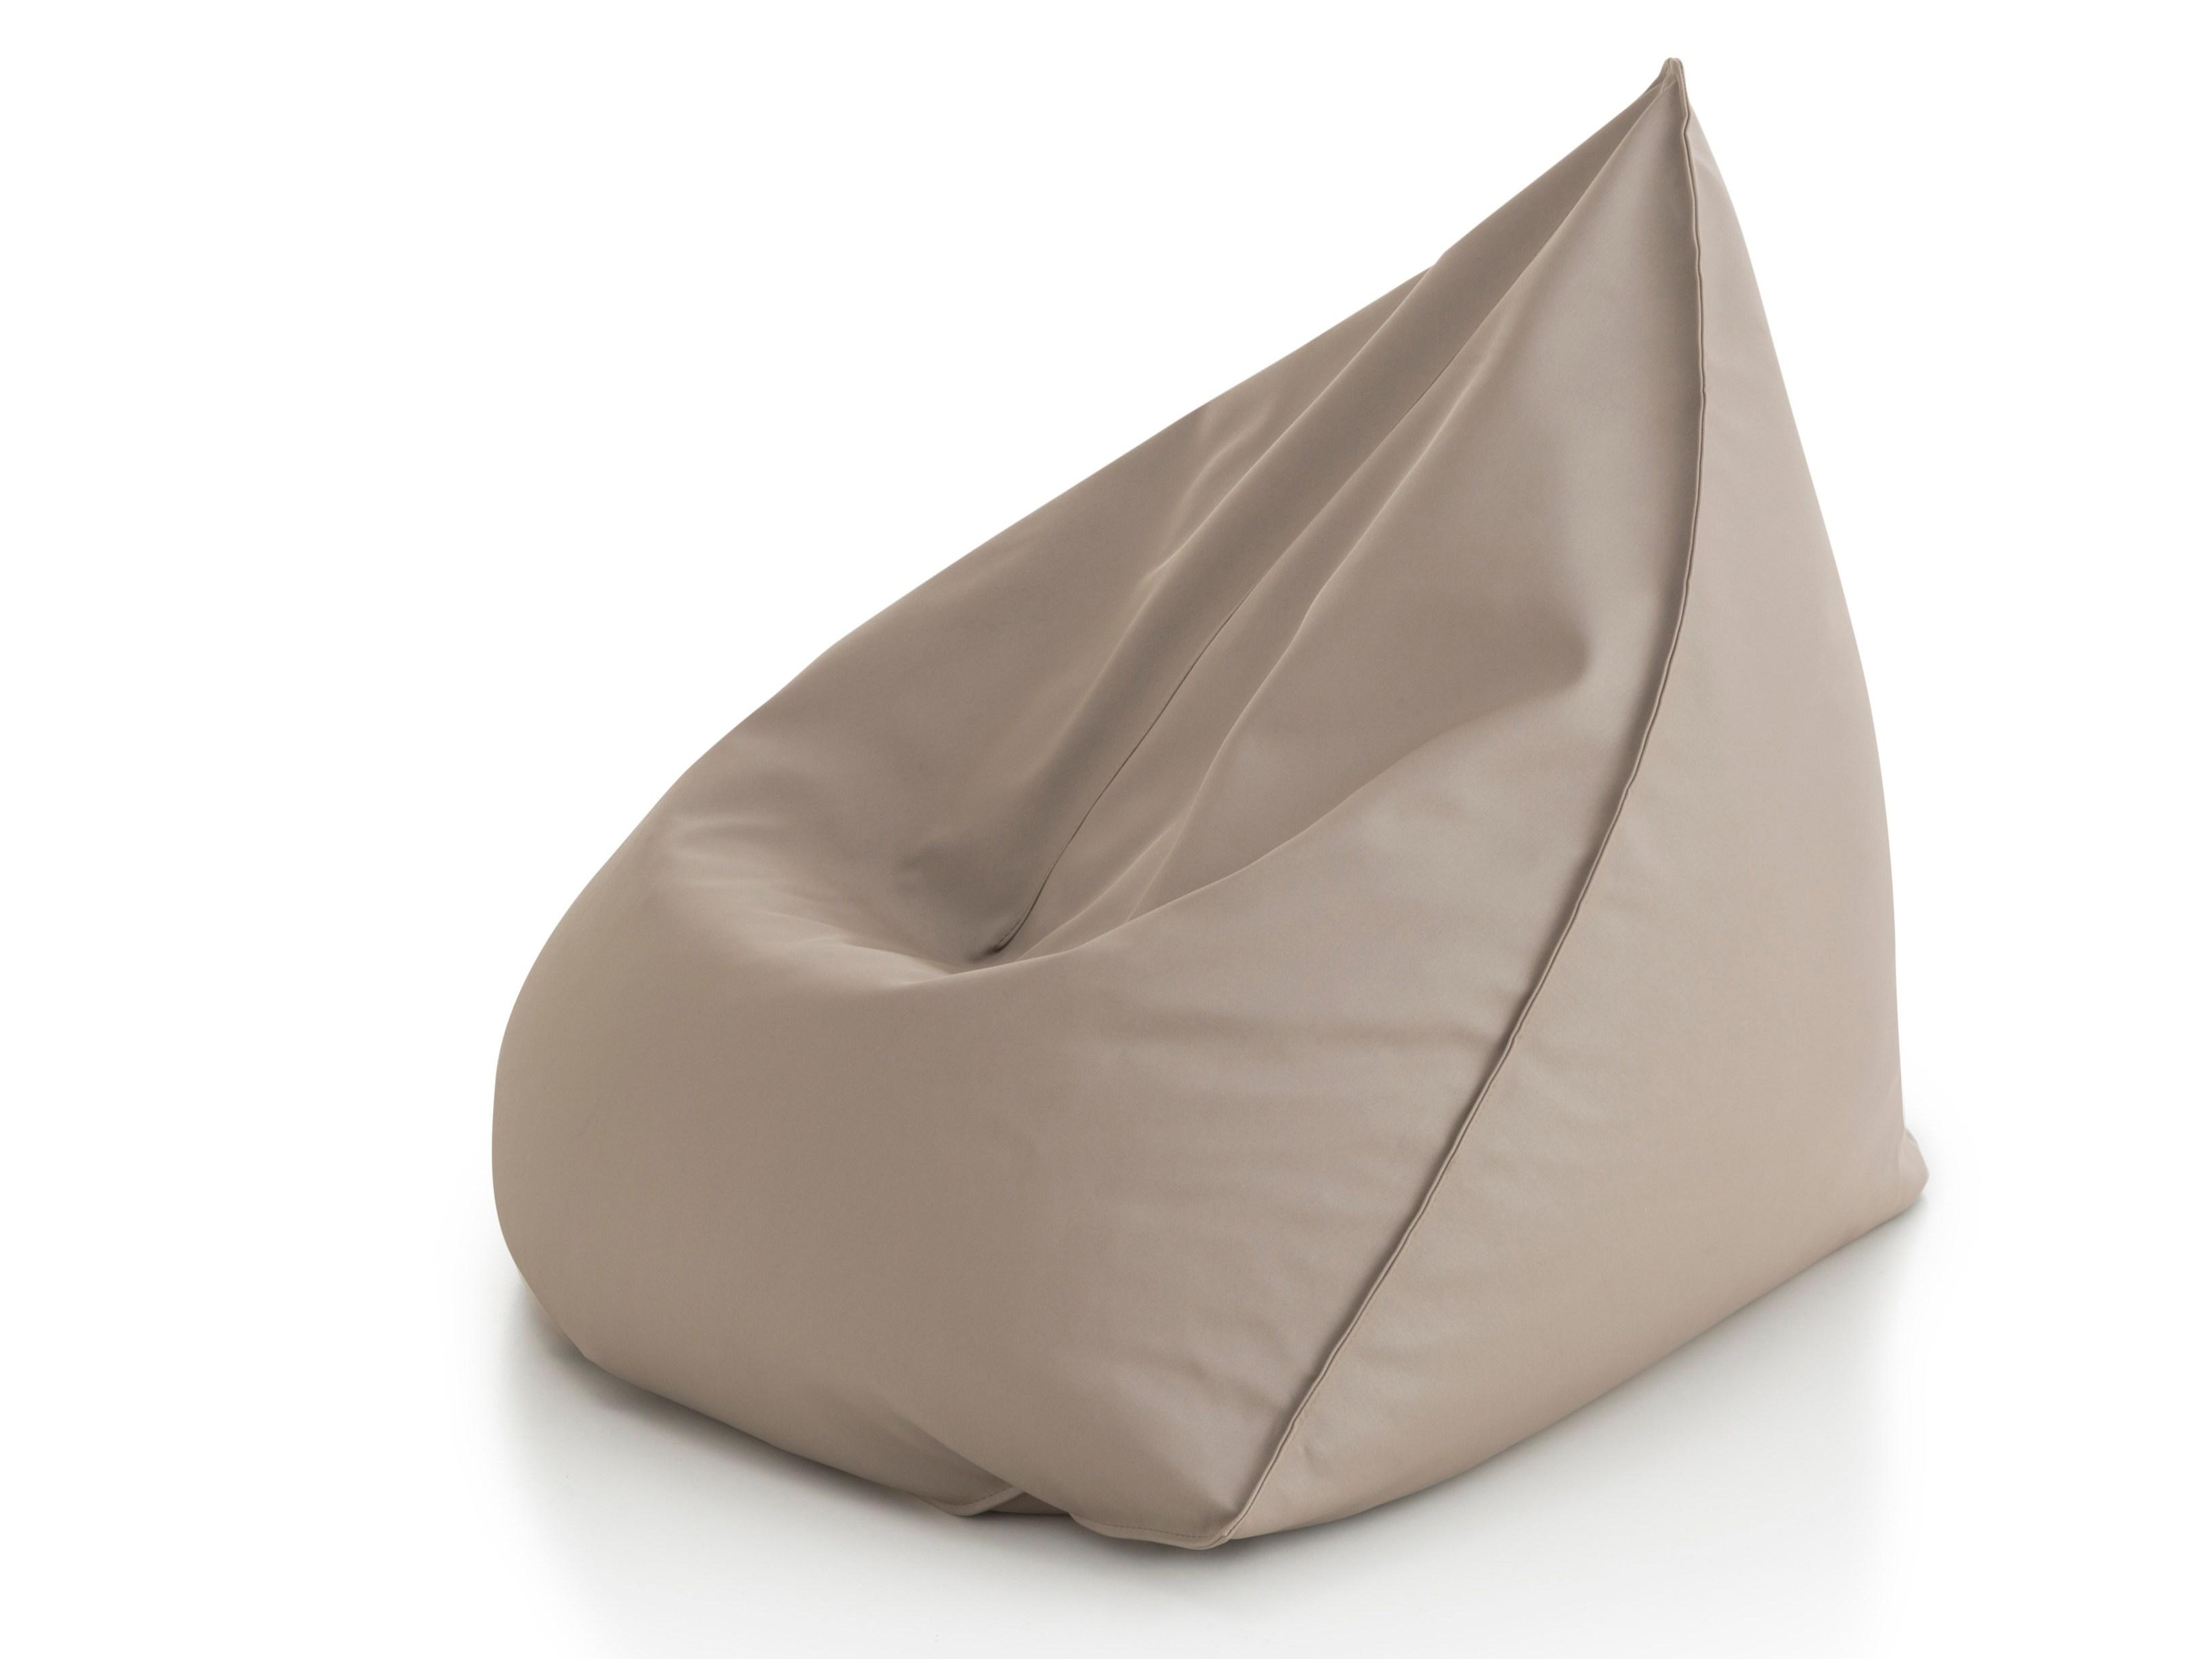 Pufa sako dla leniucha z ozdobami